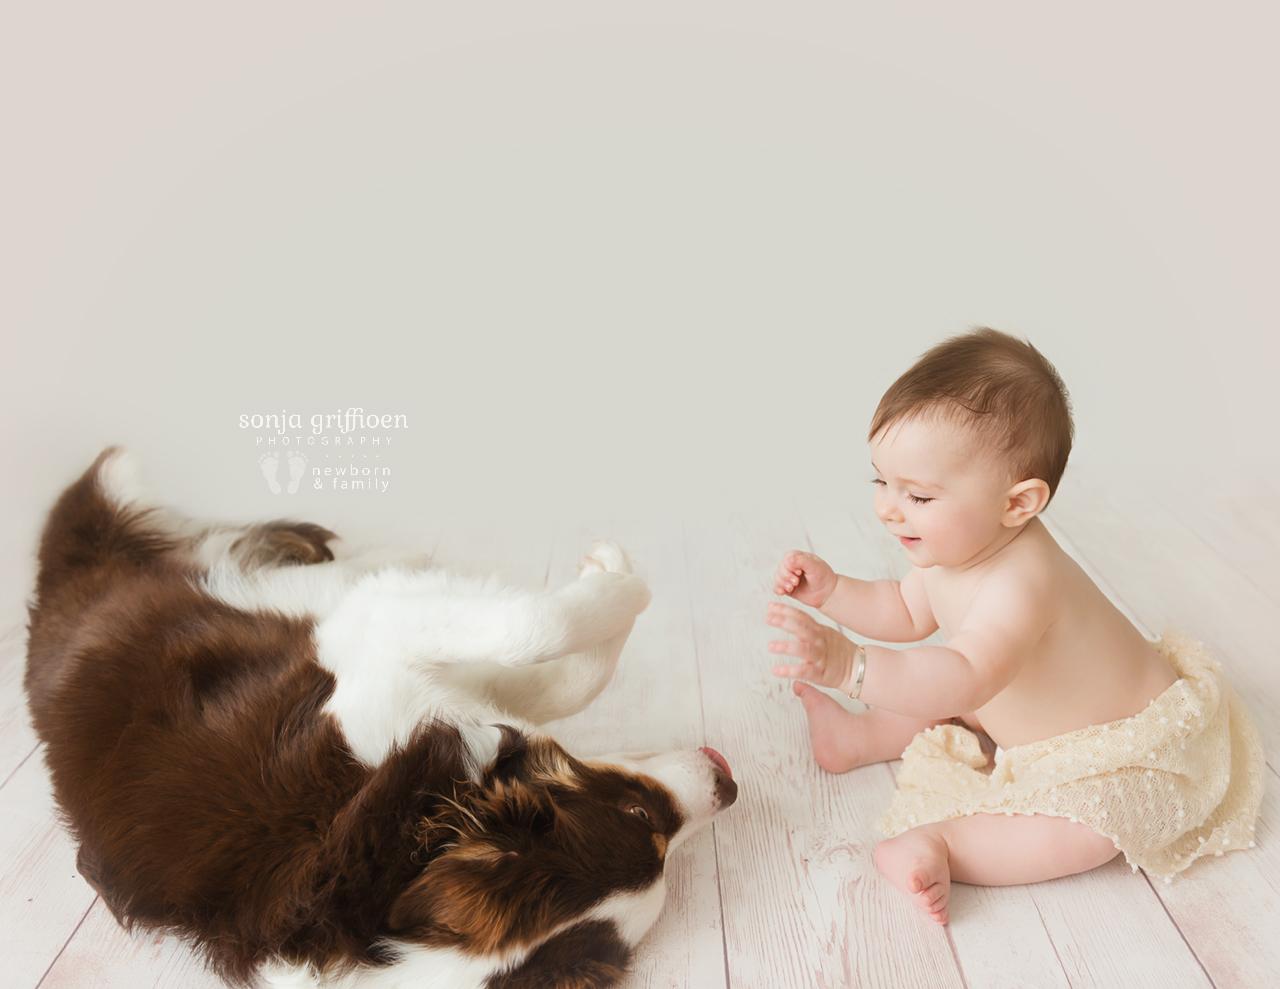 Annabella-Milestone-Brisbane-Baby-Photographer-Sonja-Griffioen-12.jpg